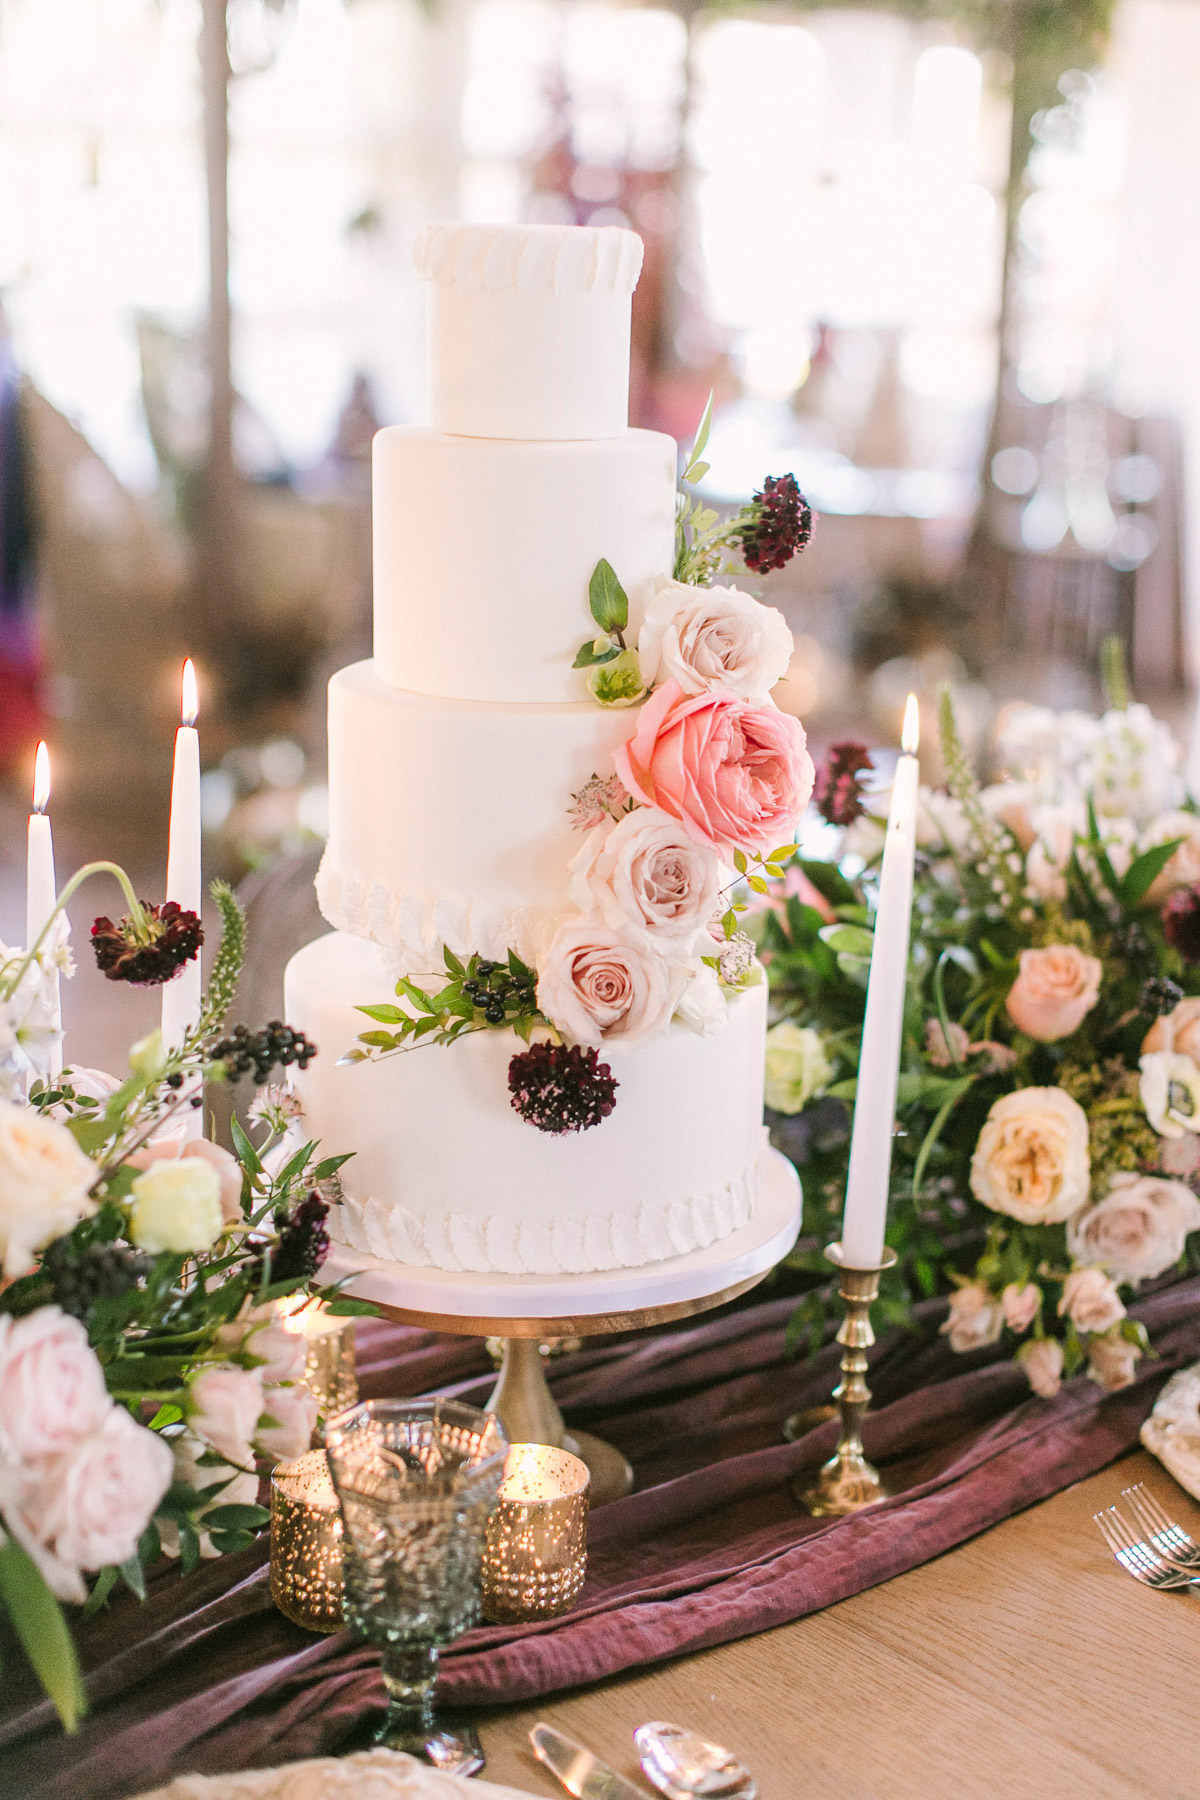 the-first-look-vineyard-bride-swish-list-kurtz-orchards-market-niagara-on-the-lake-wedding-show-21.jpg